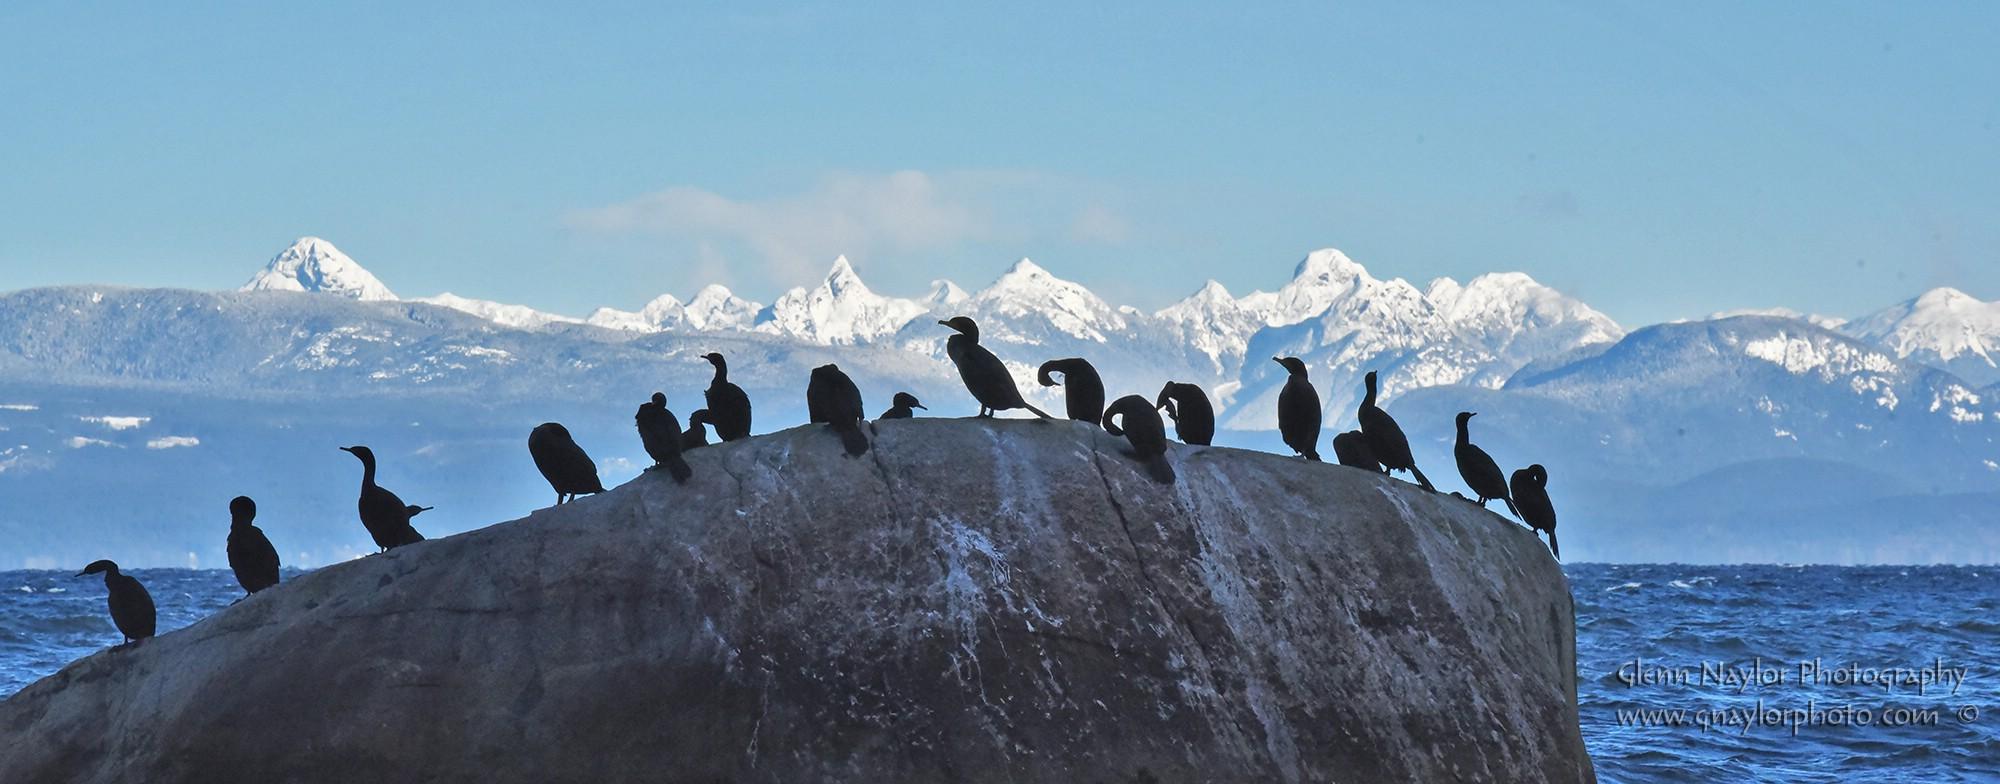 Cormorants, Seal Bay Nature Park